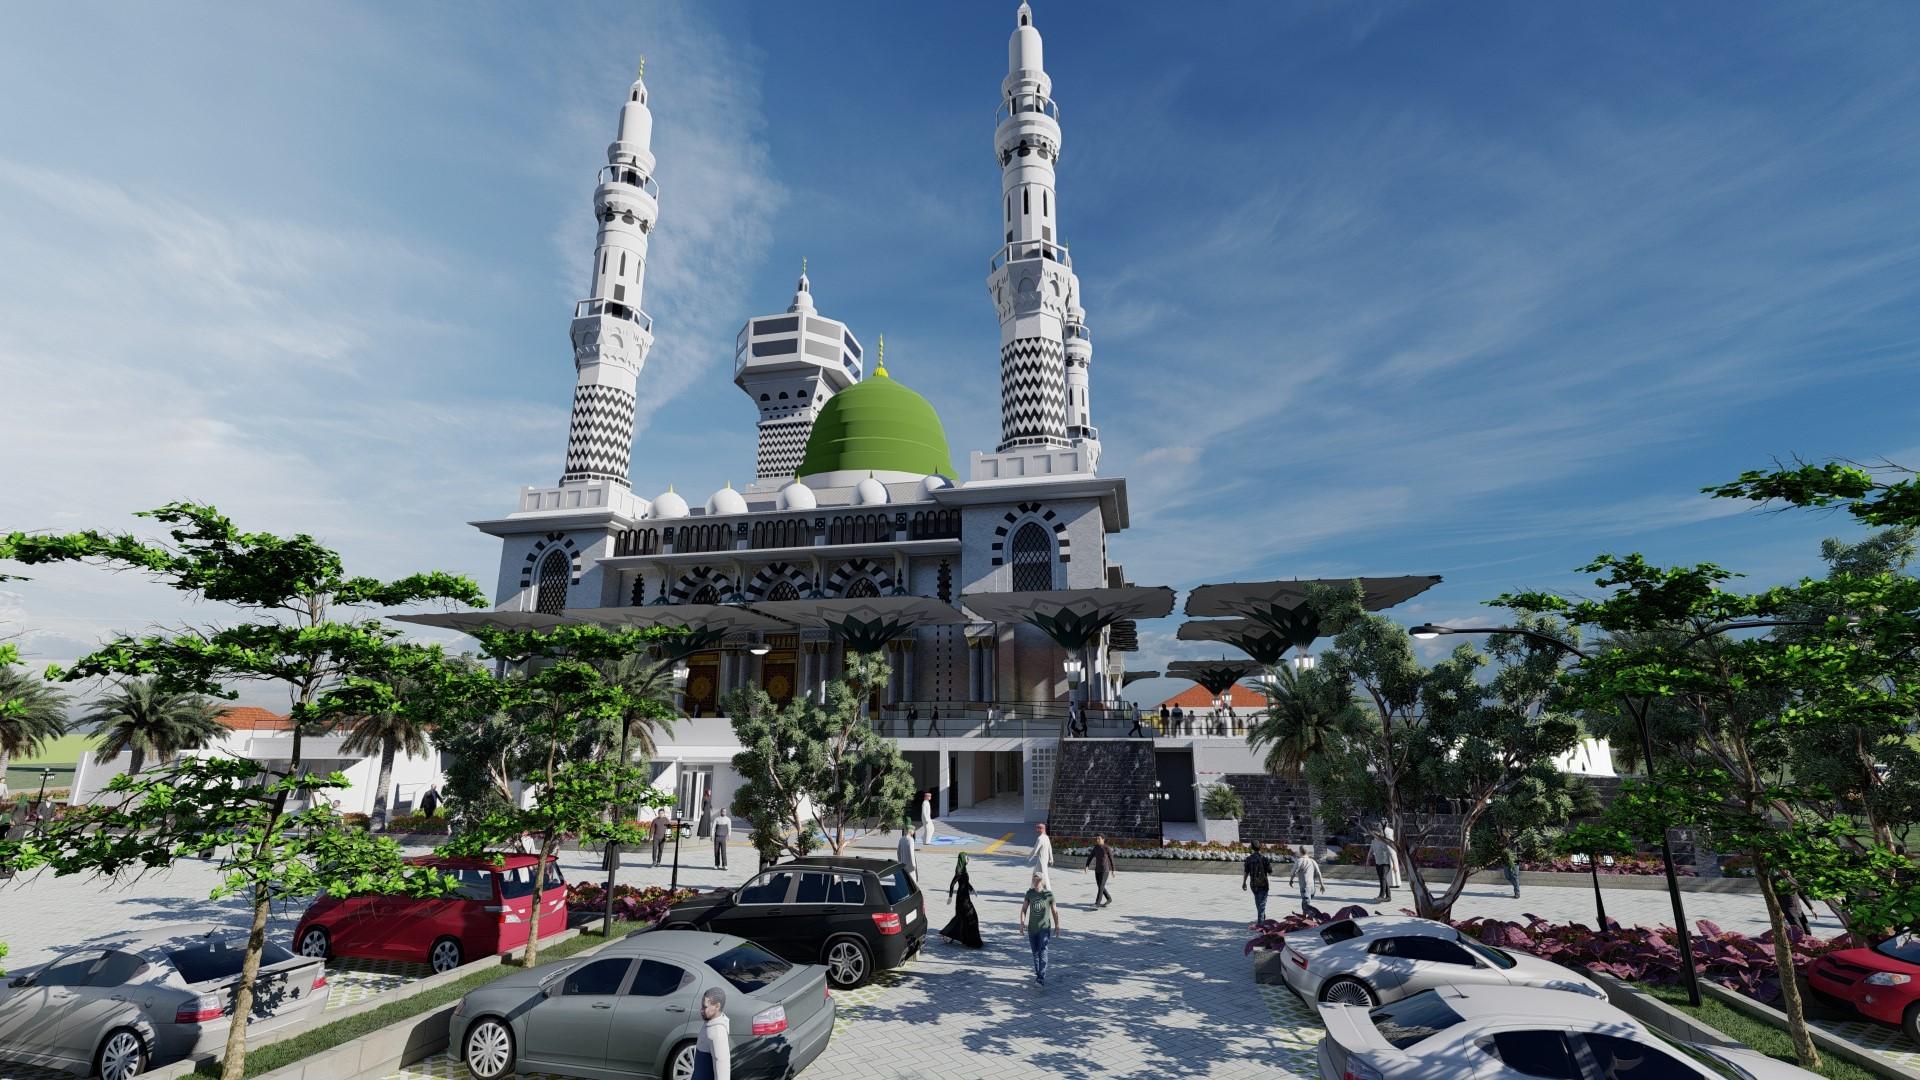 2019 DED Masjid Agung Karanganyar-01